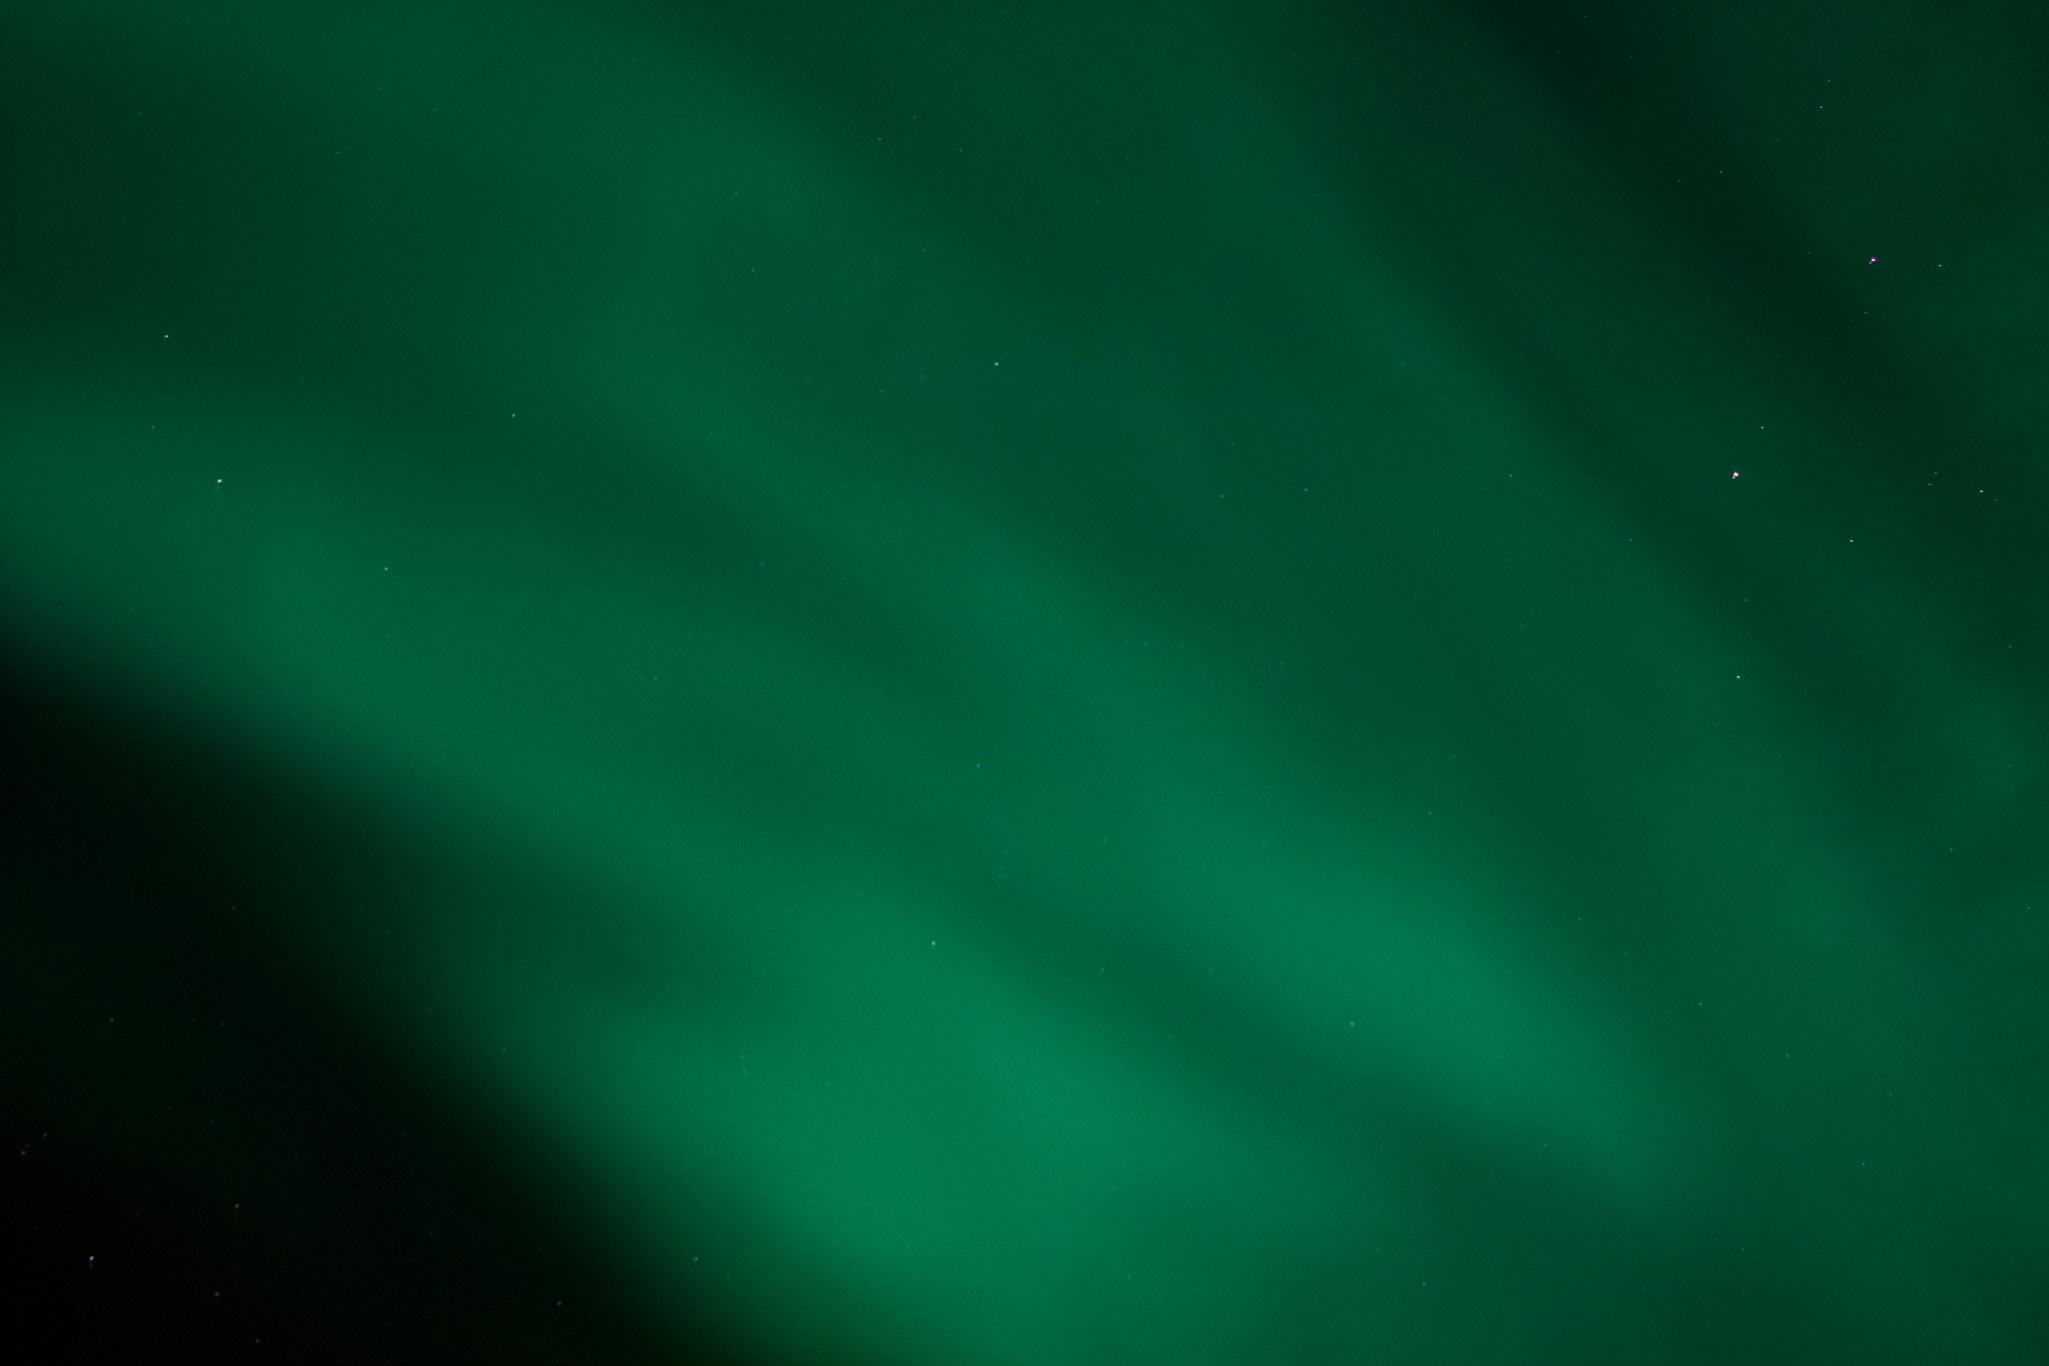 DSC_0226-2.jpg